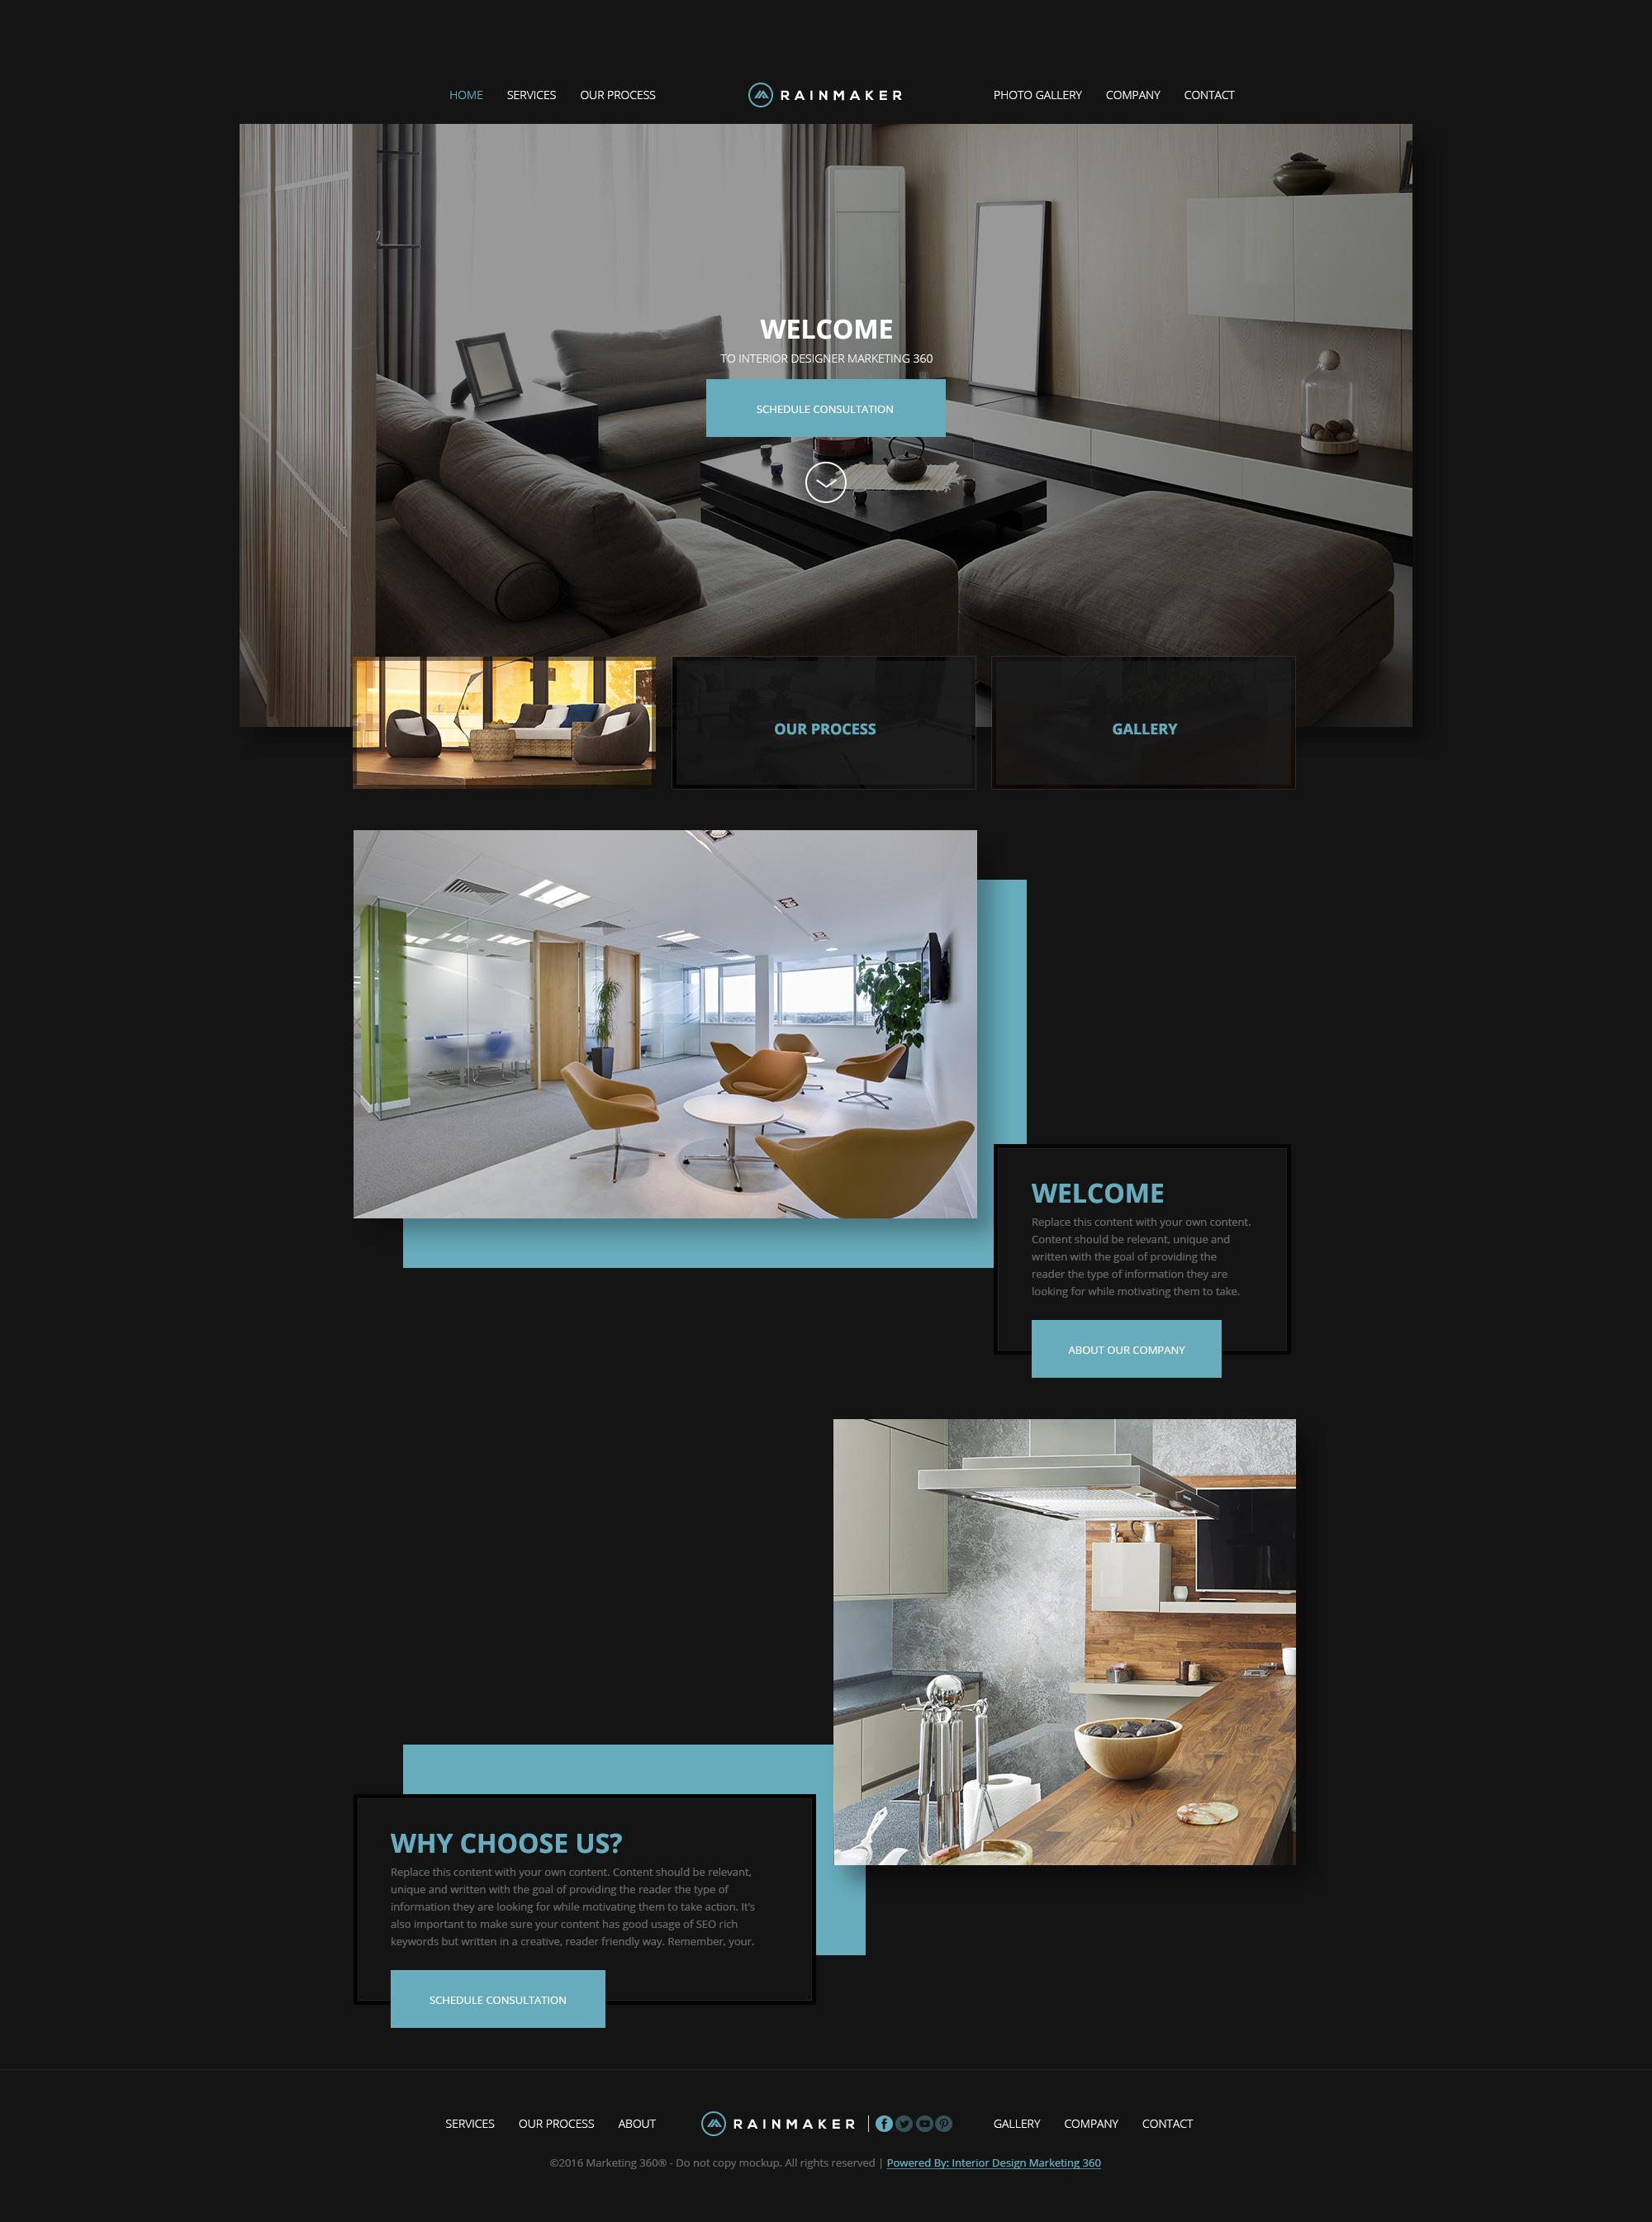 Design RM27031